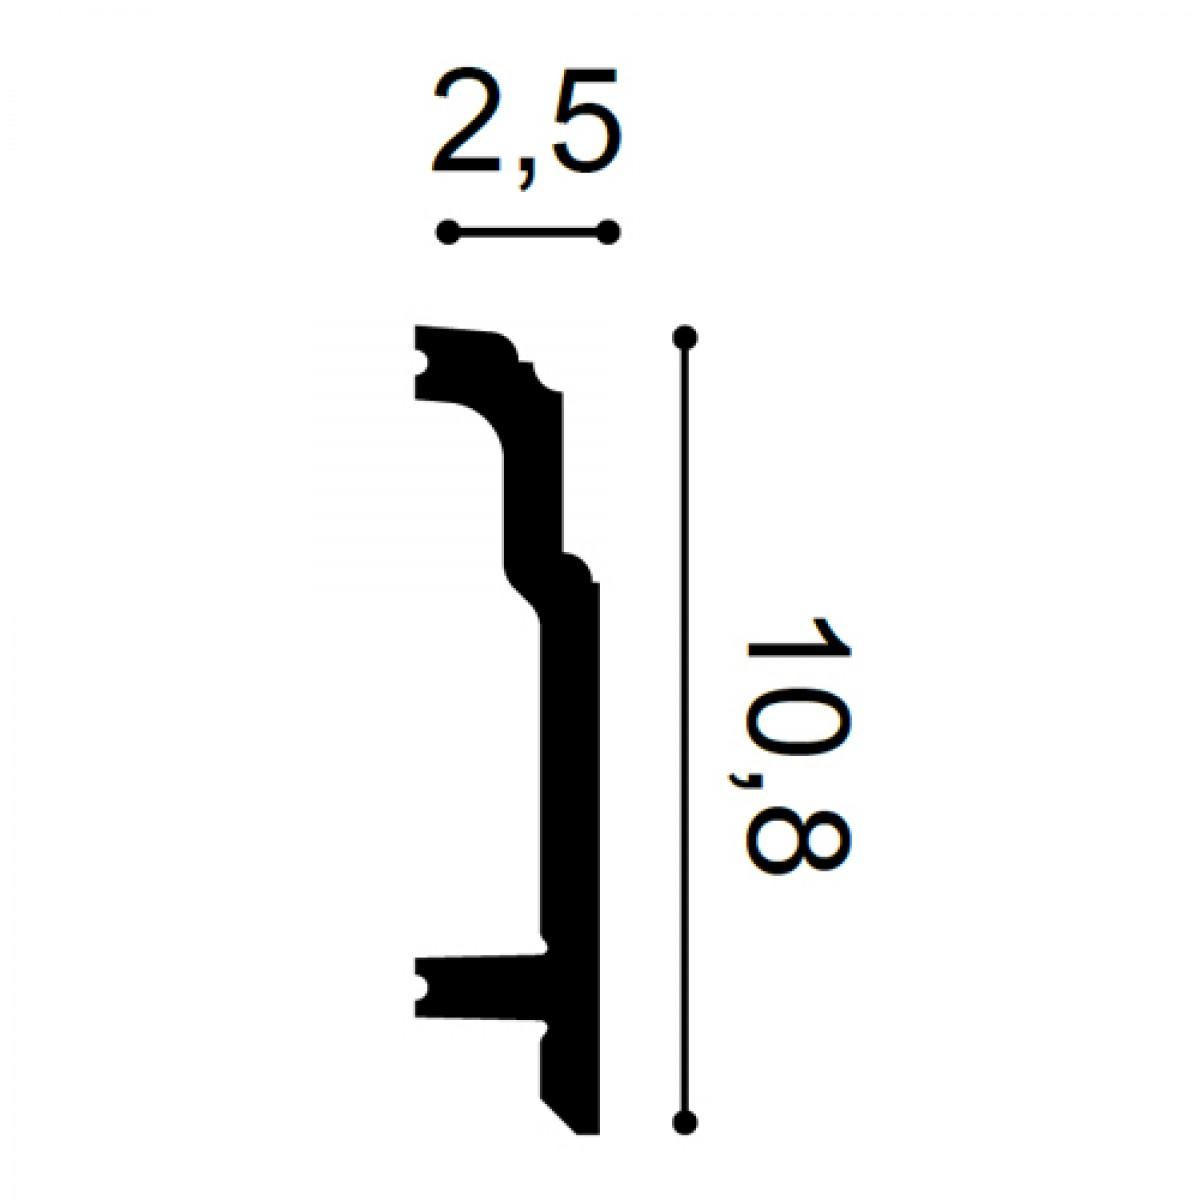 Plinta Flex Luxxus SX155F, Dimensiuni: 200 X 10.8 X 2.5 cm, Orac Decor